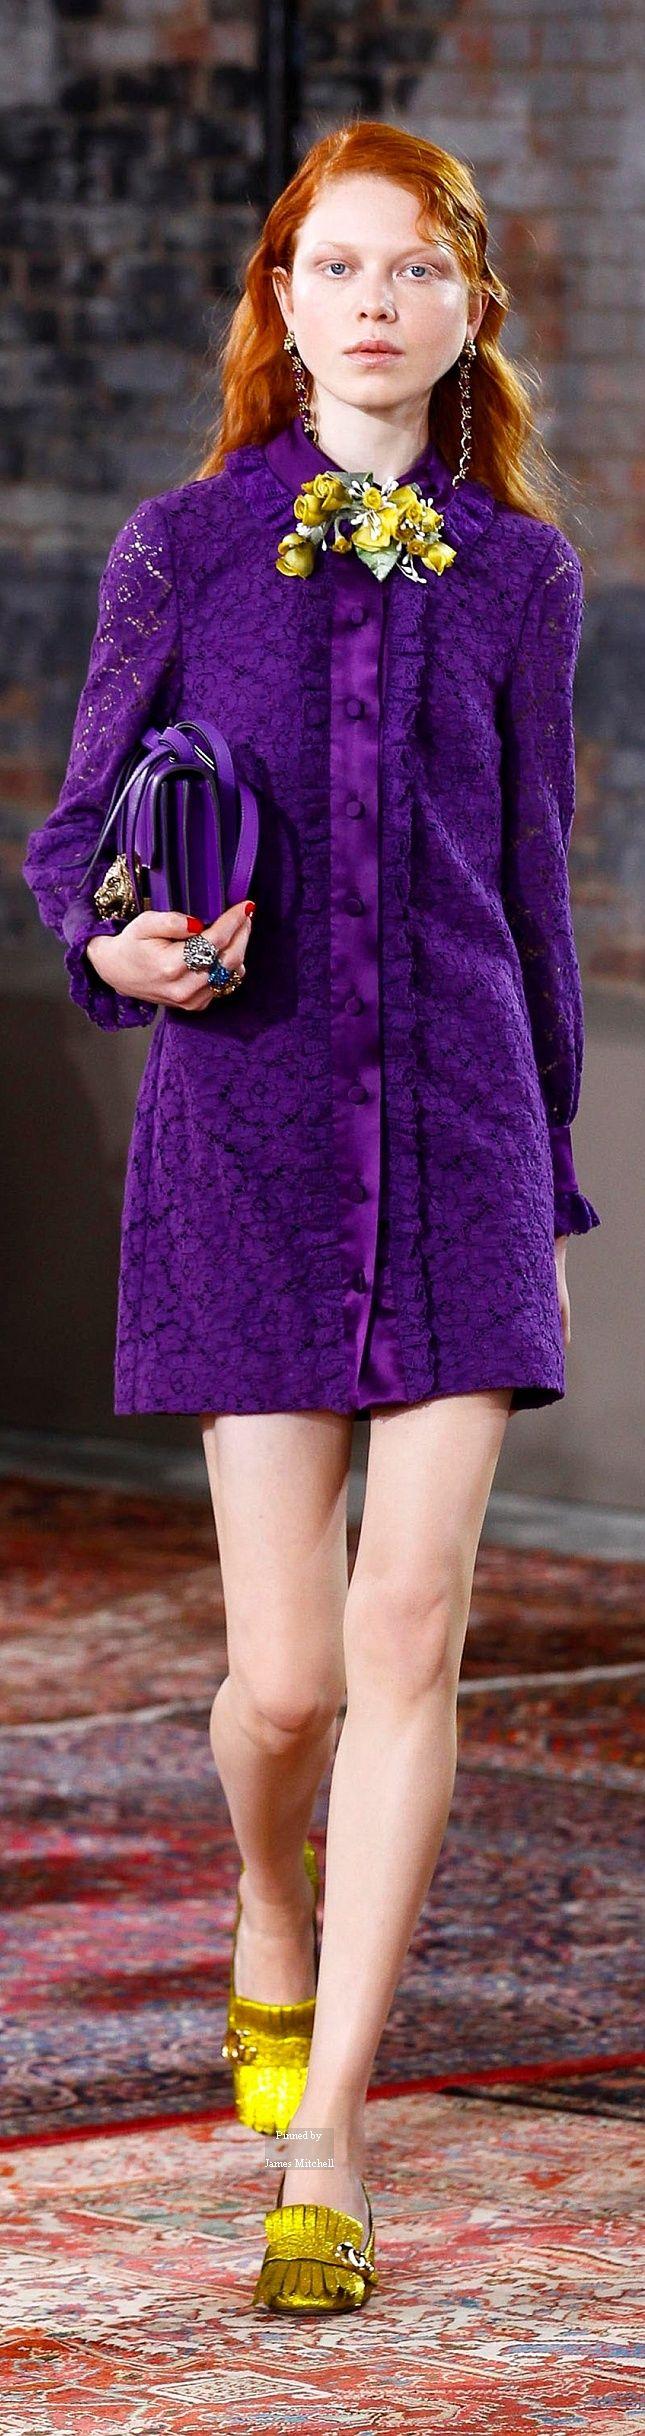 Gucci Pre Spring 2016 collection rechte jurkstretch kant, knopenrij in satijn voorkant, opstaand kraagje